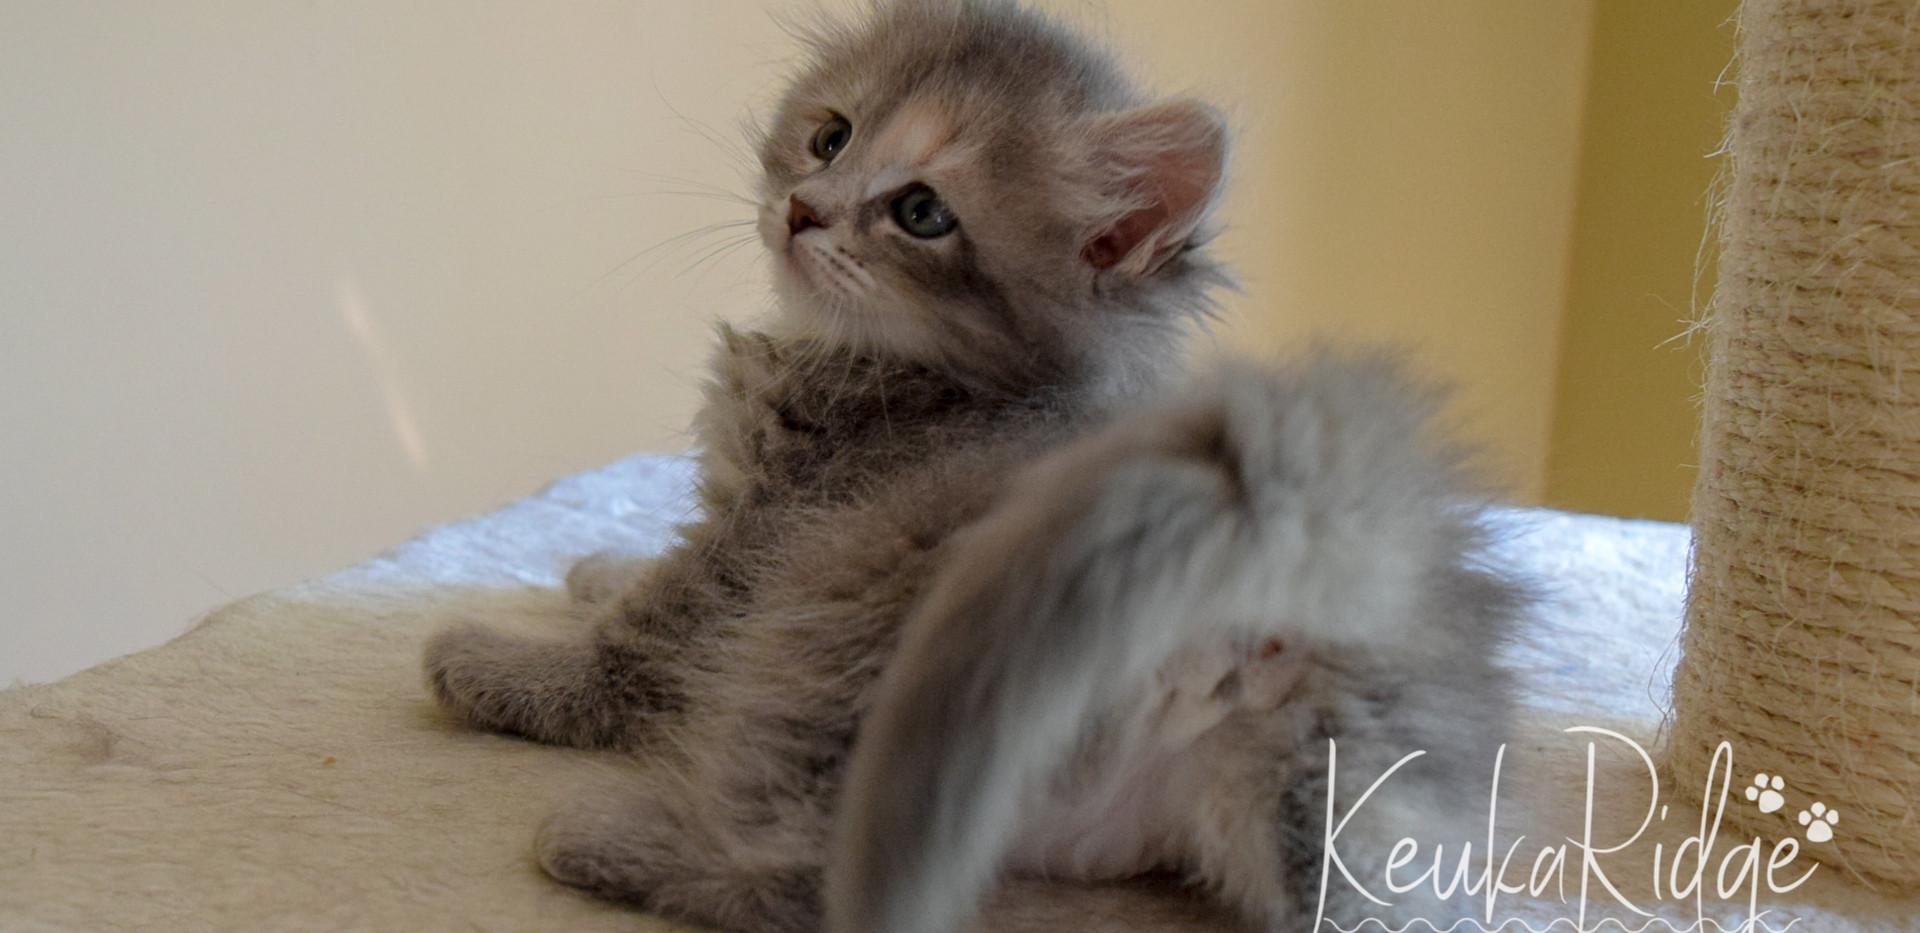 Keuka Ridge Felicity - 7 Weeks Old